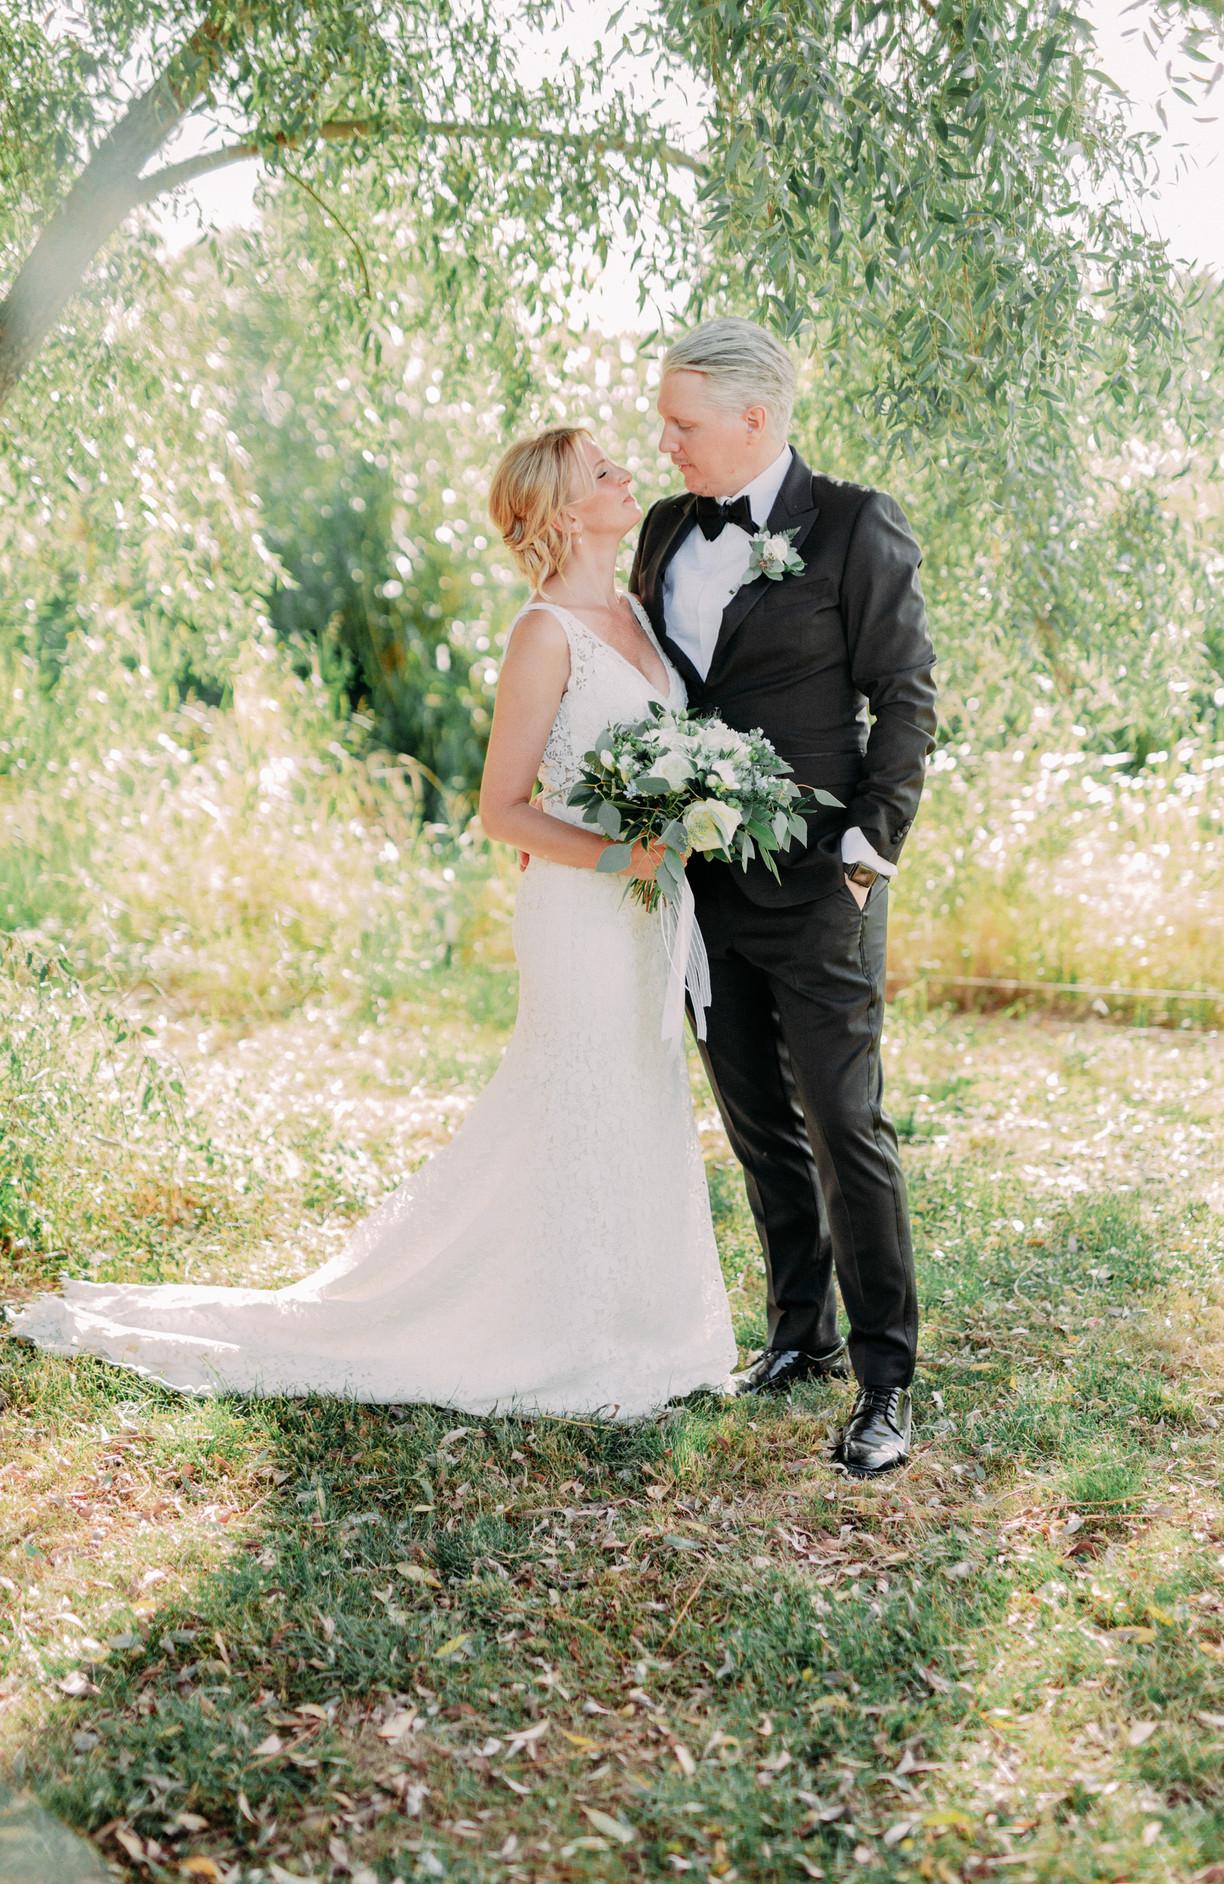 Erica & Stefan, Södertuna Slott